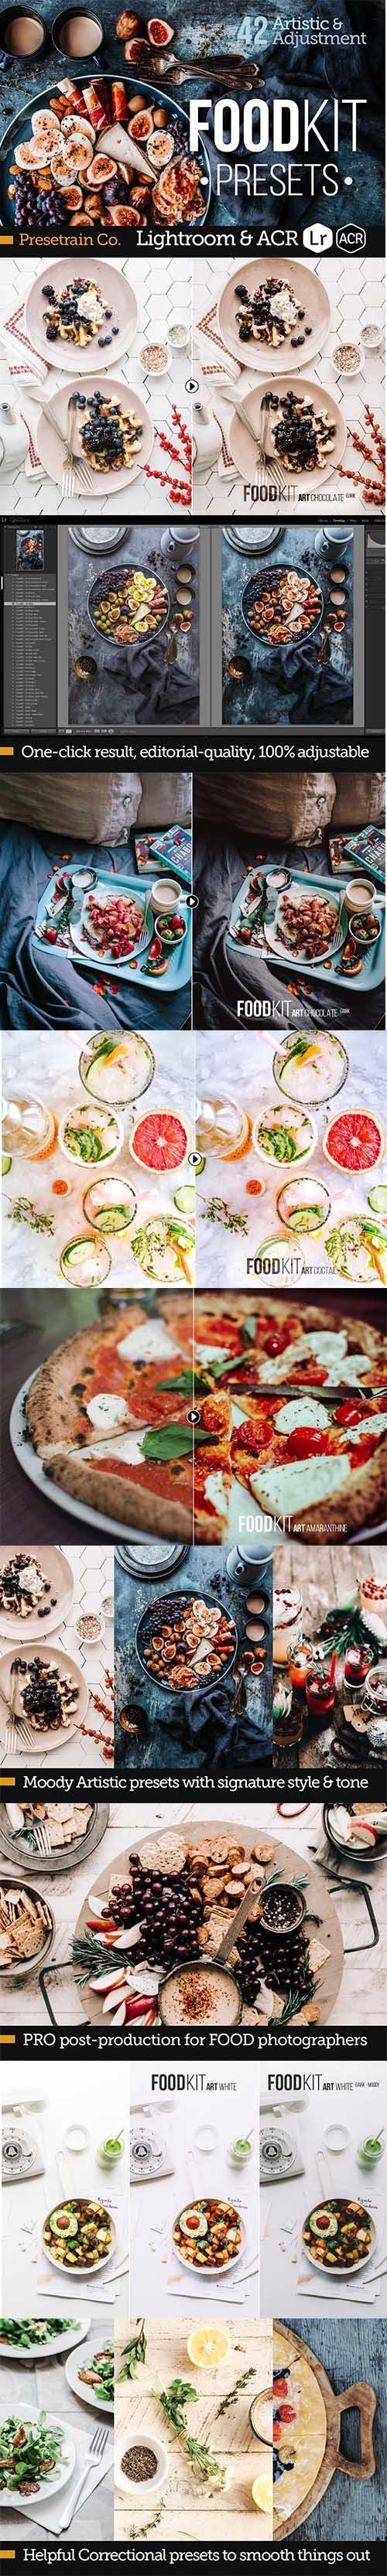 FoodKit - Food Presets for Lightroom & ACR